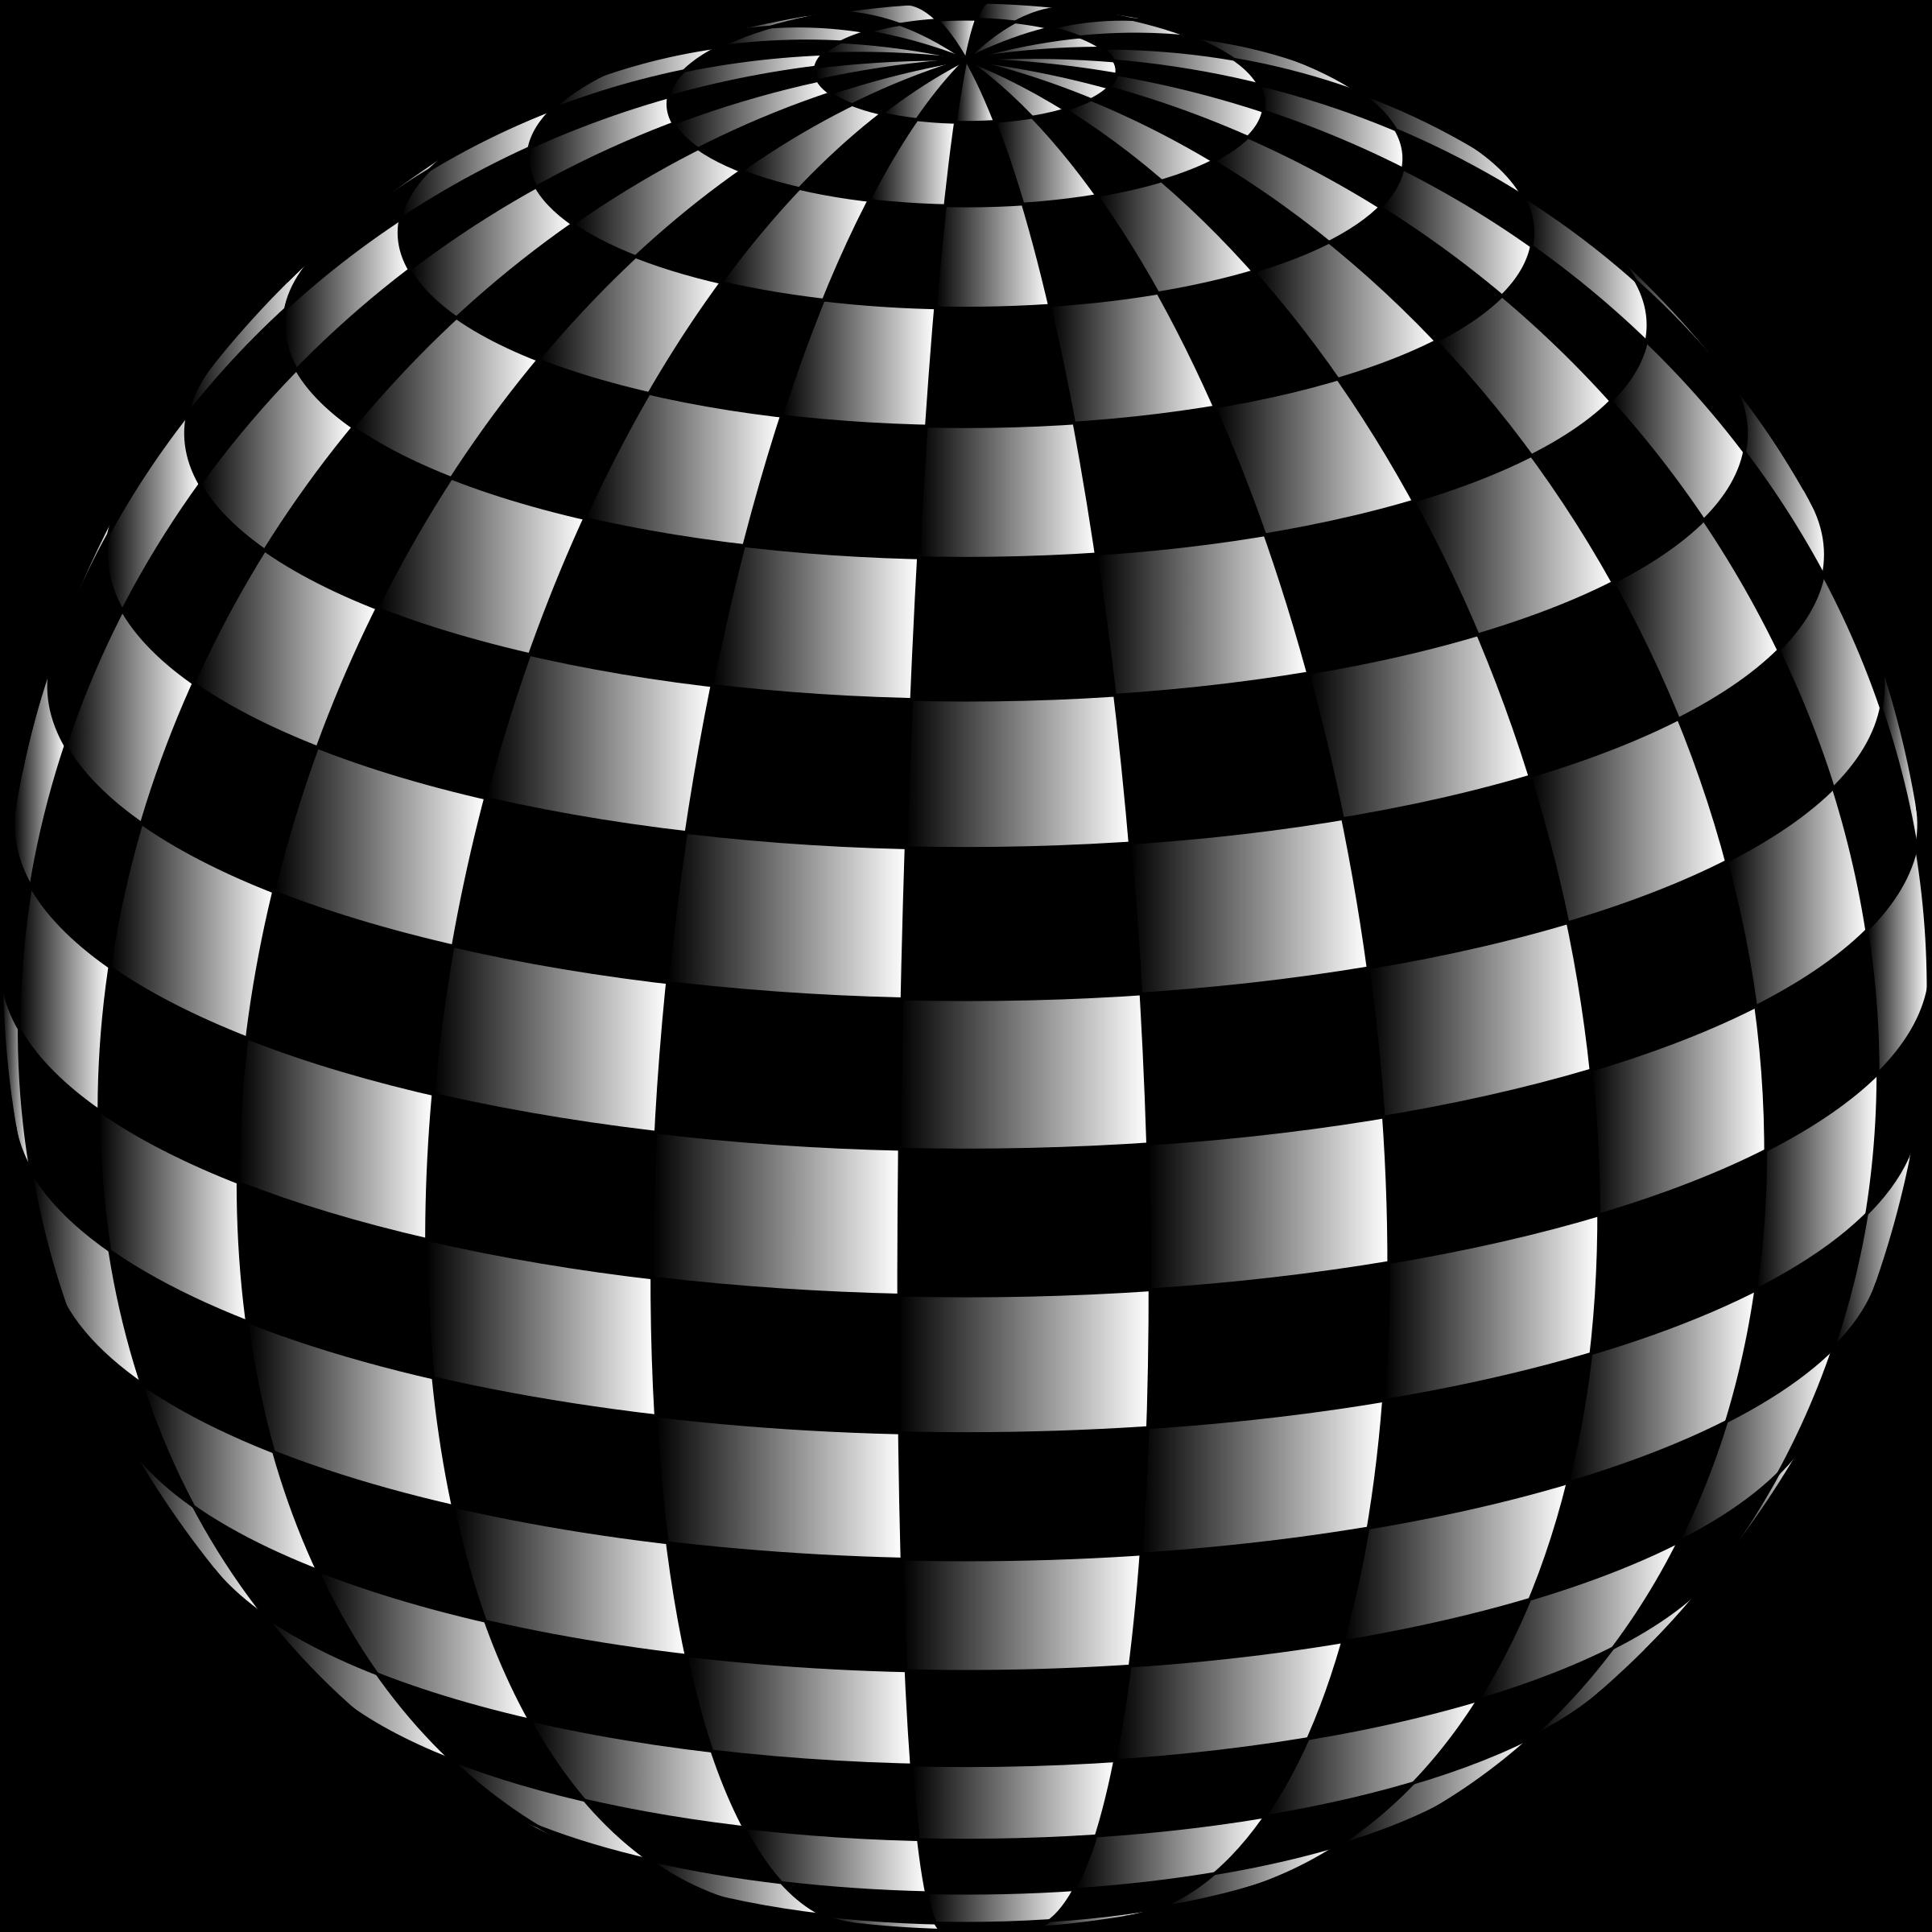 Clipart - Sphere 5